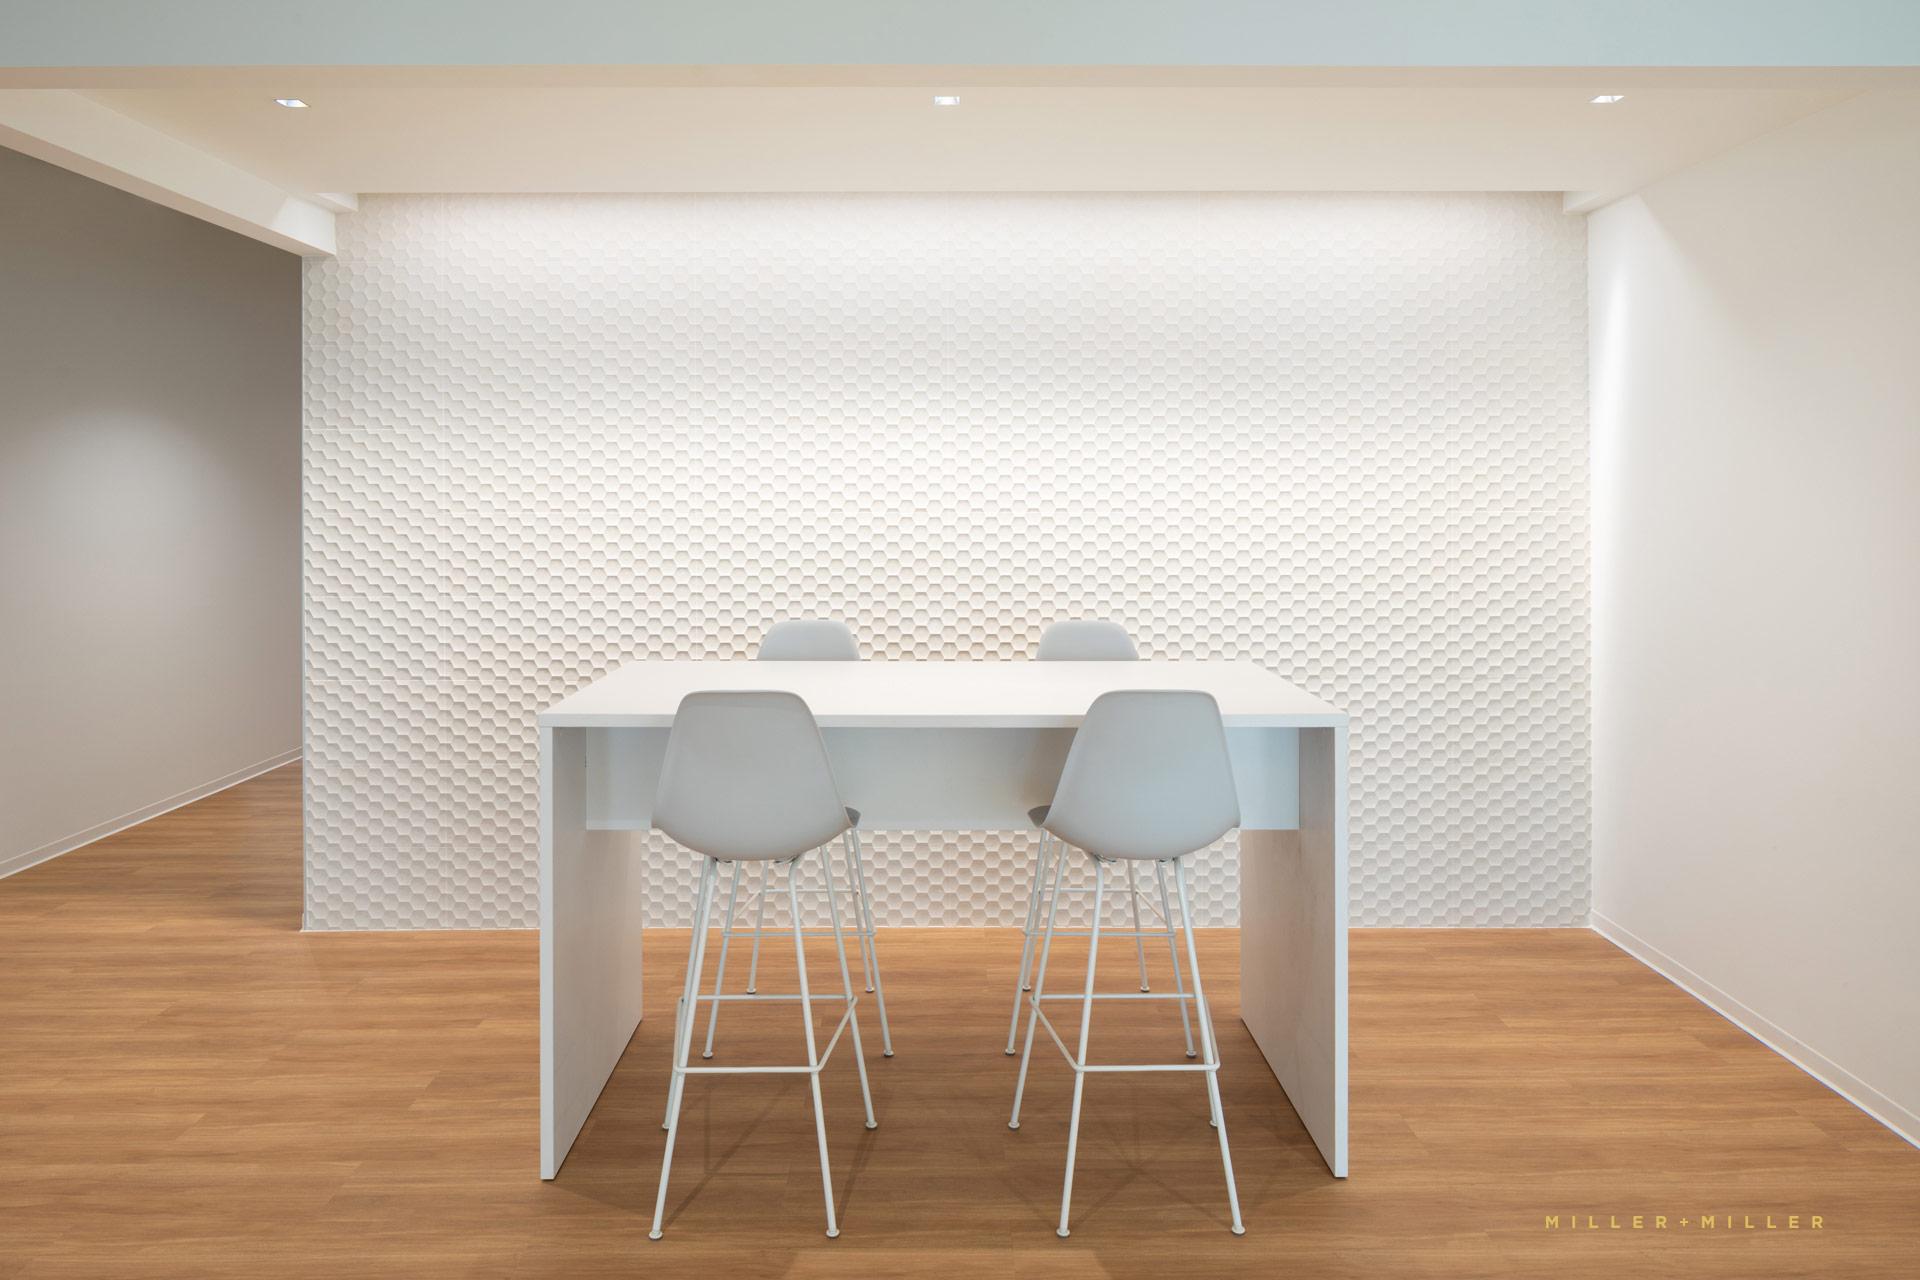 3D Wall Texture Panels Decorative Facade